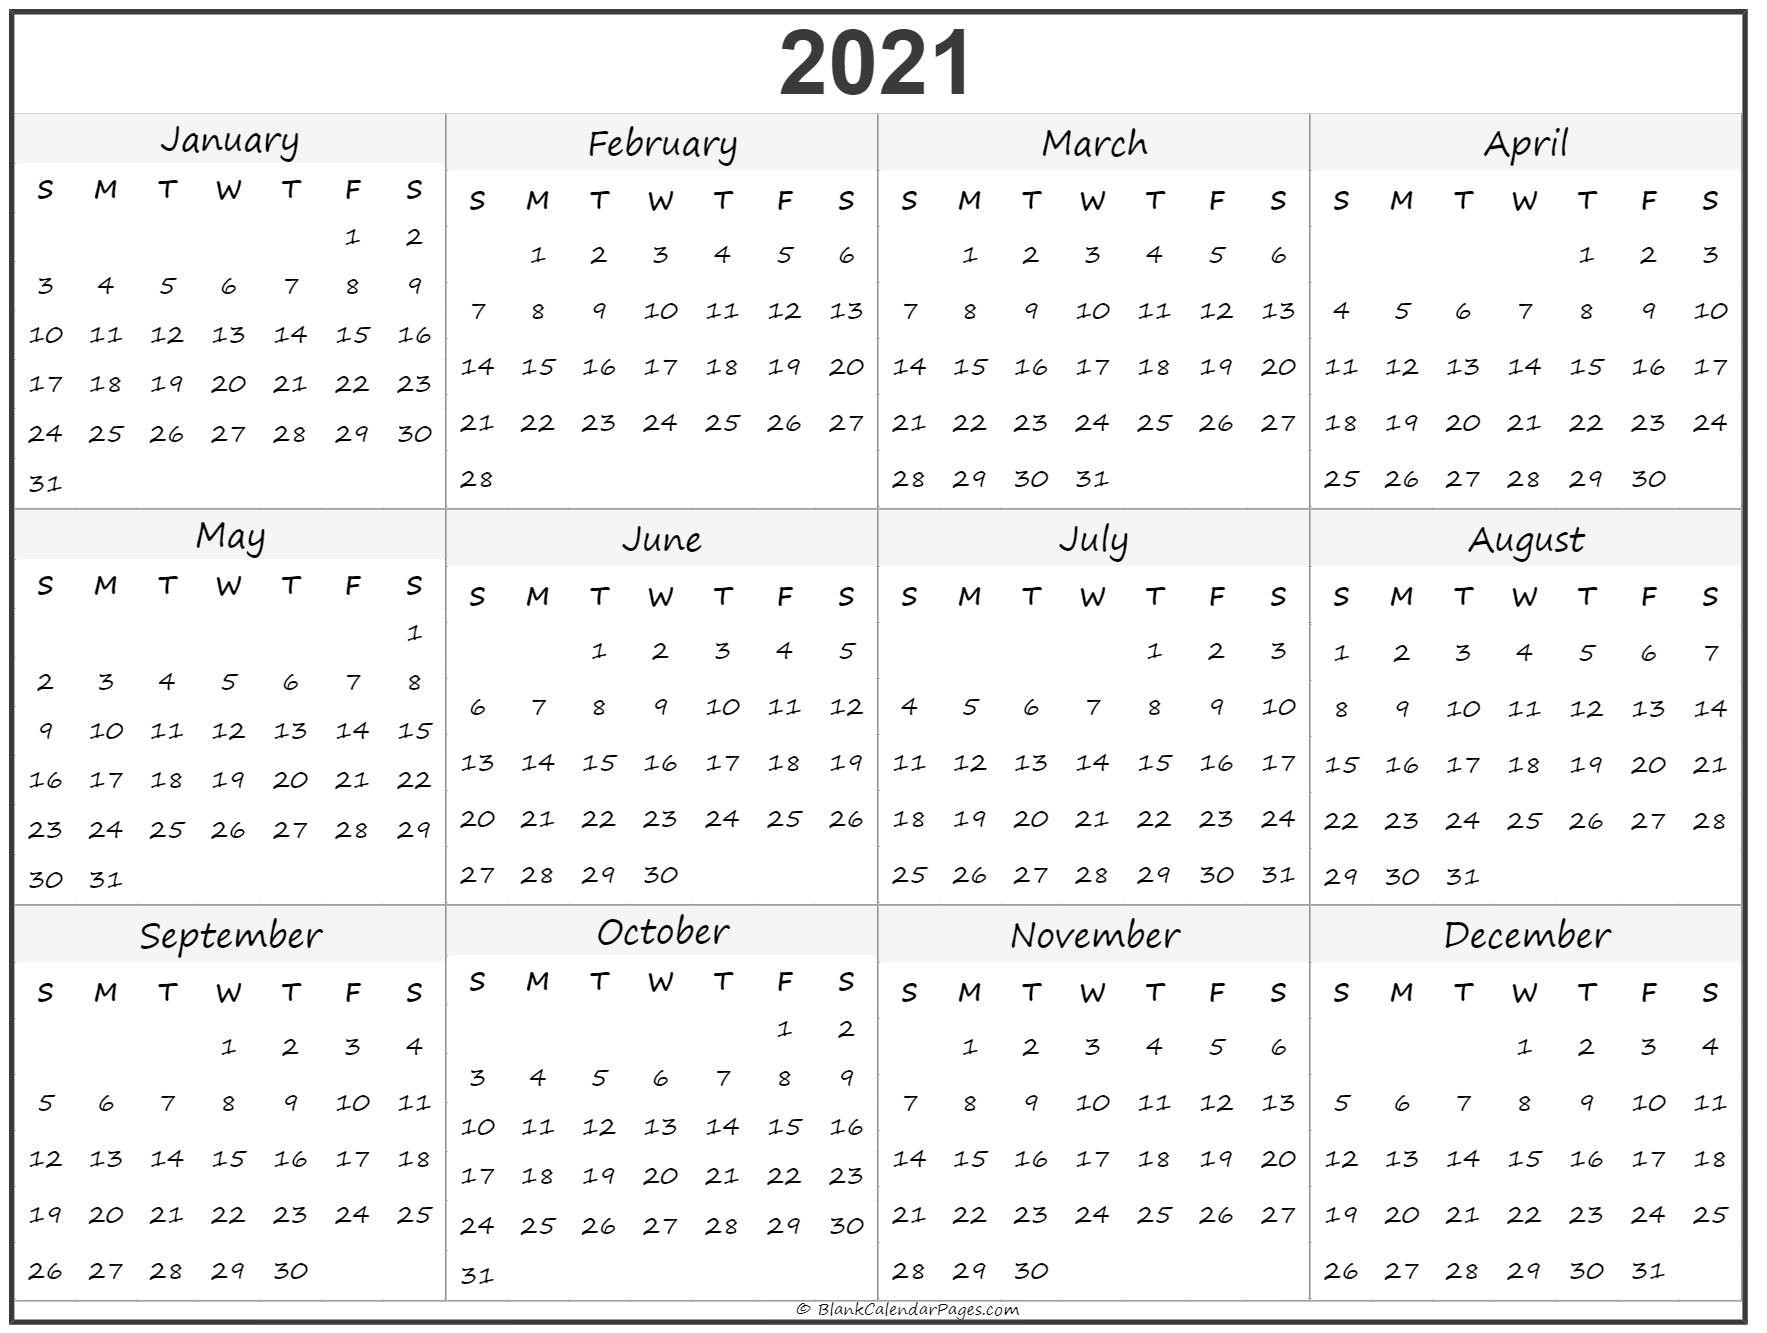 3 Month Calendar 2021 Printable Free To Take | Free throughout 3 Month Calendar 2021 Printable Free